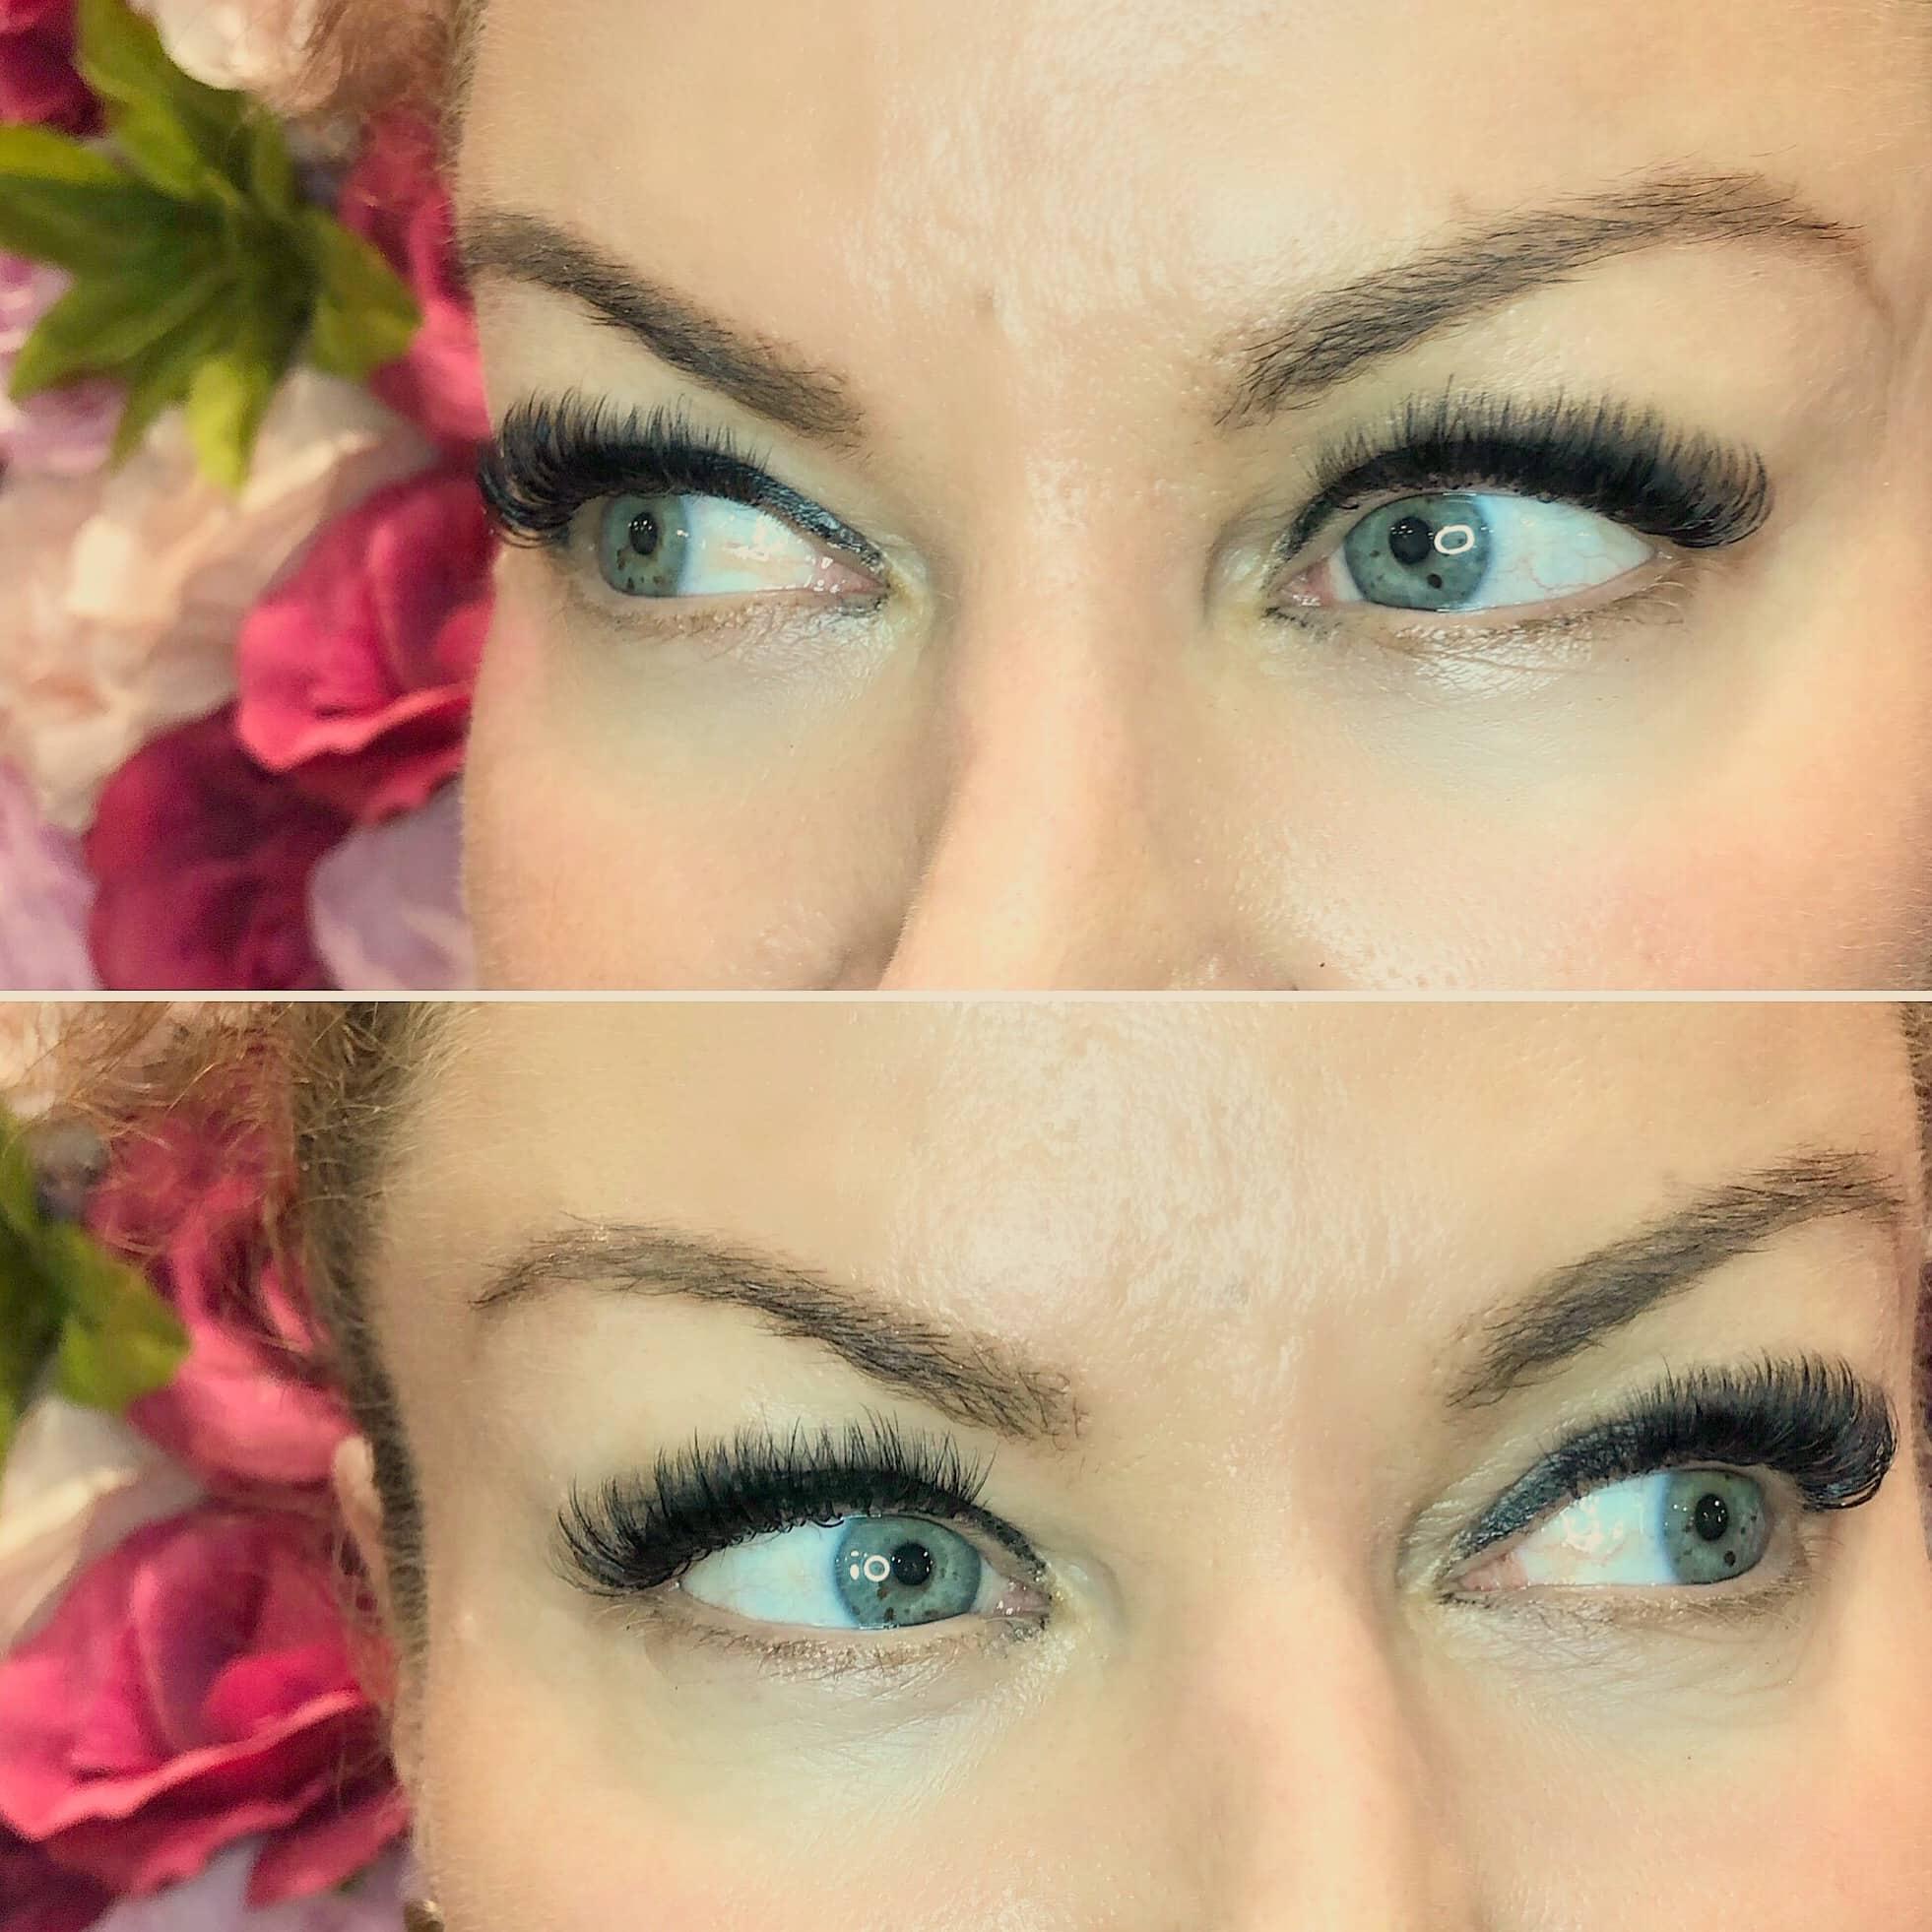 Eyelash Extensions Melbourne | Classic, Hybrid or Volume Lashes